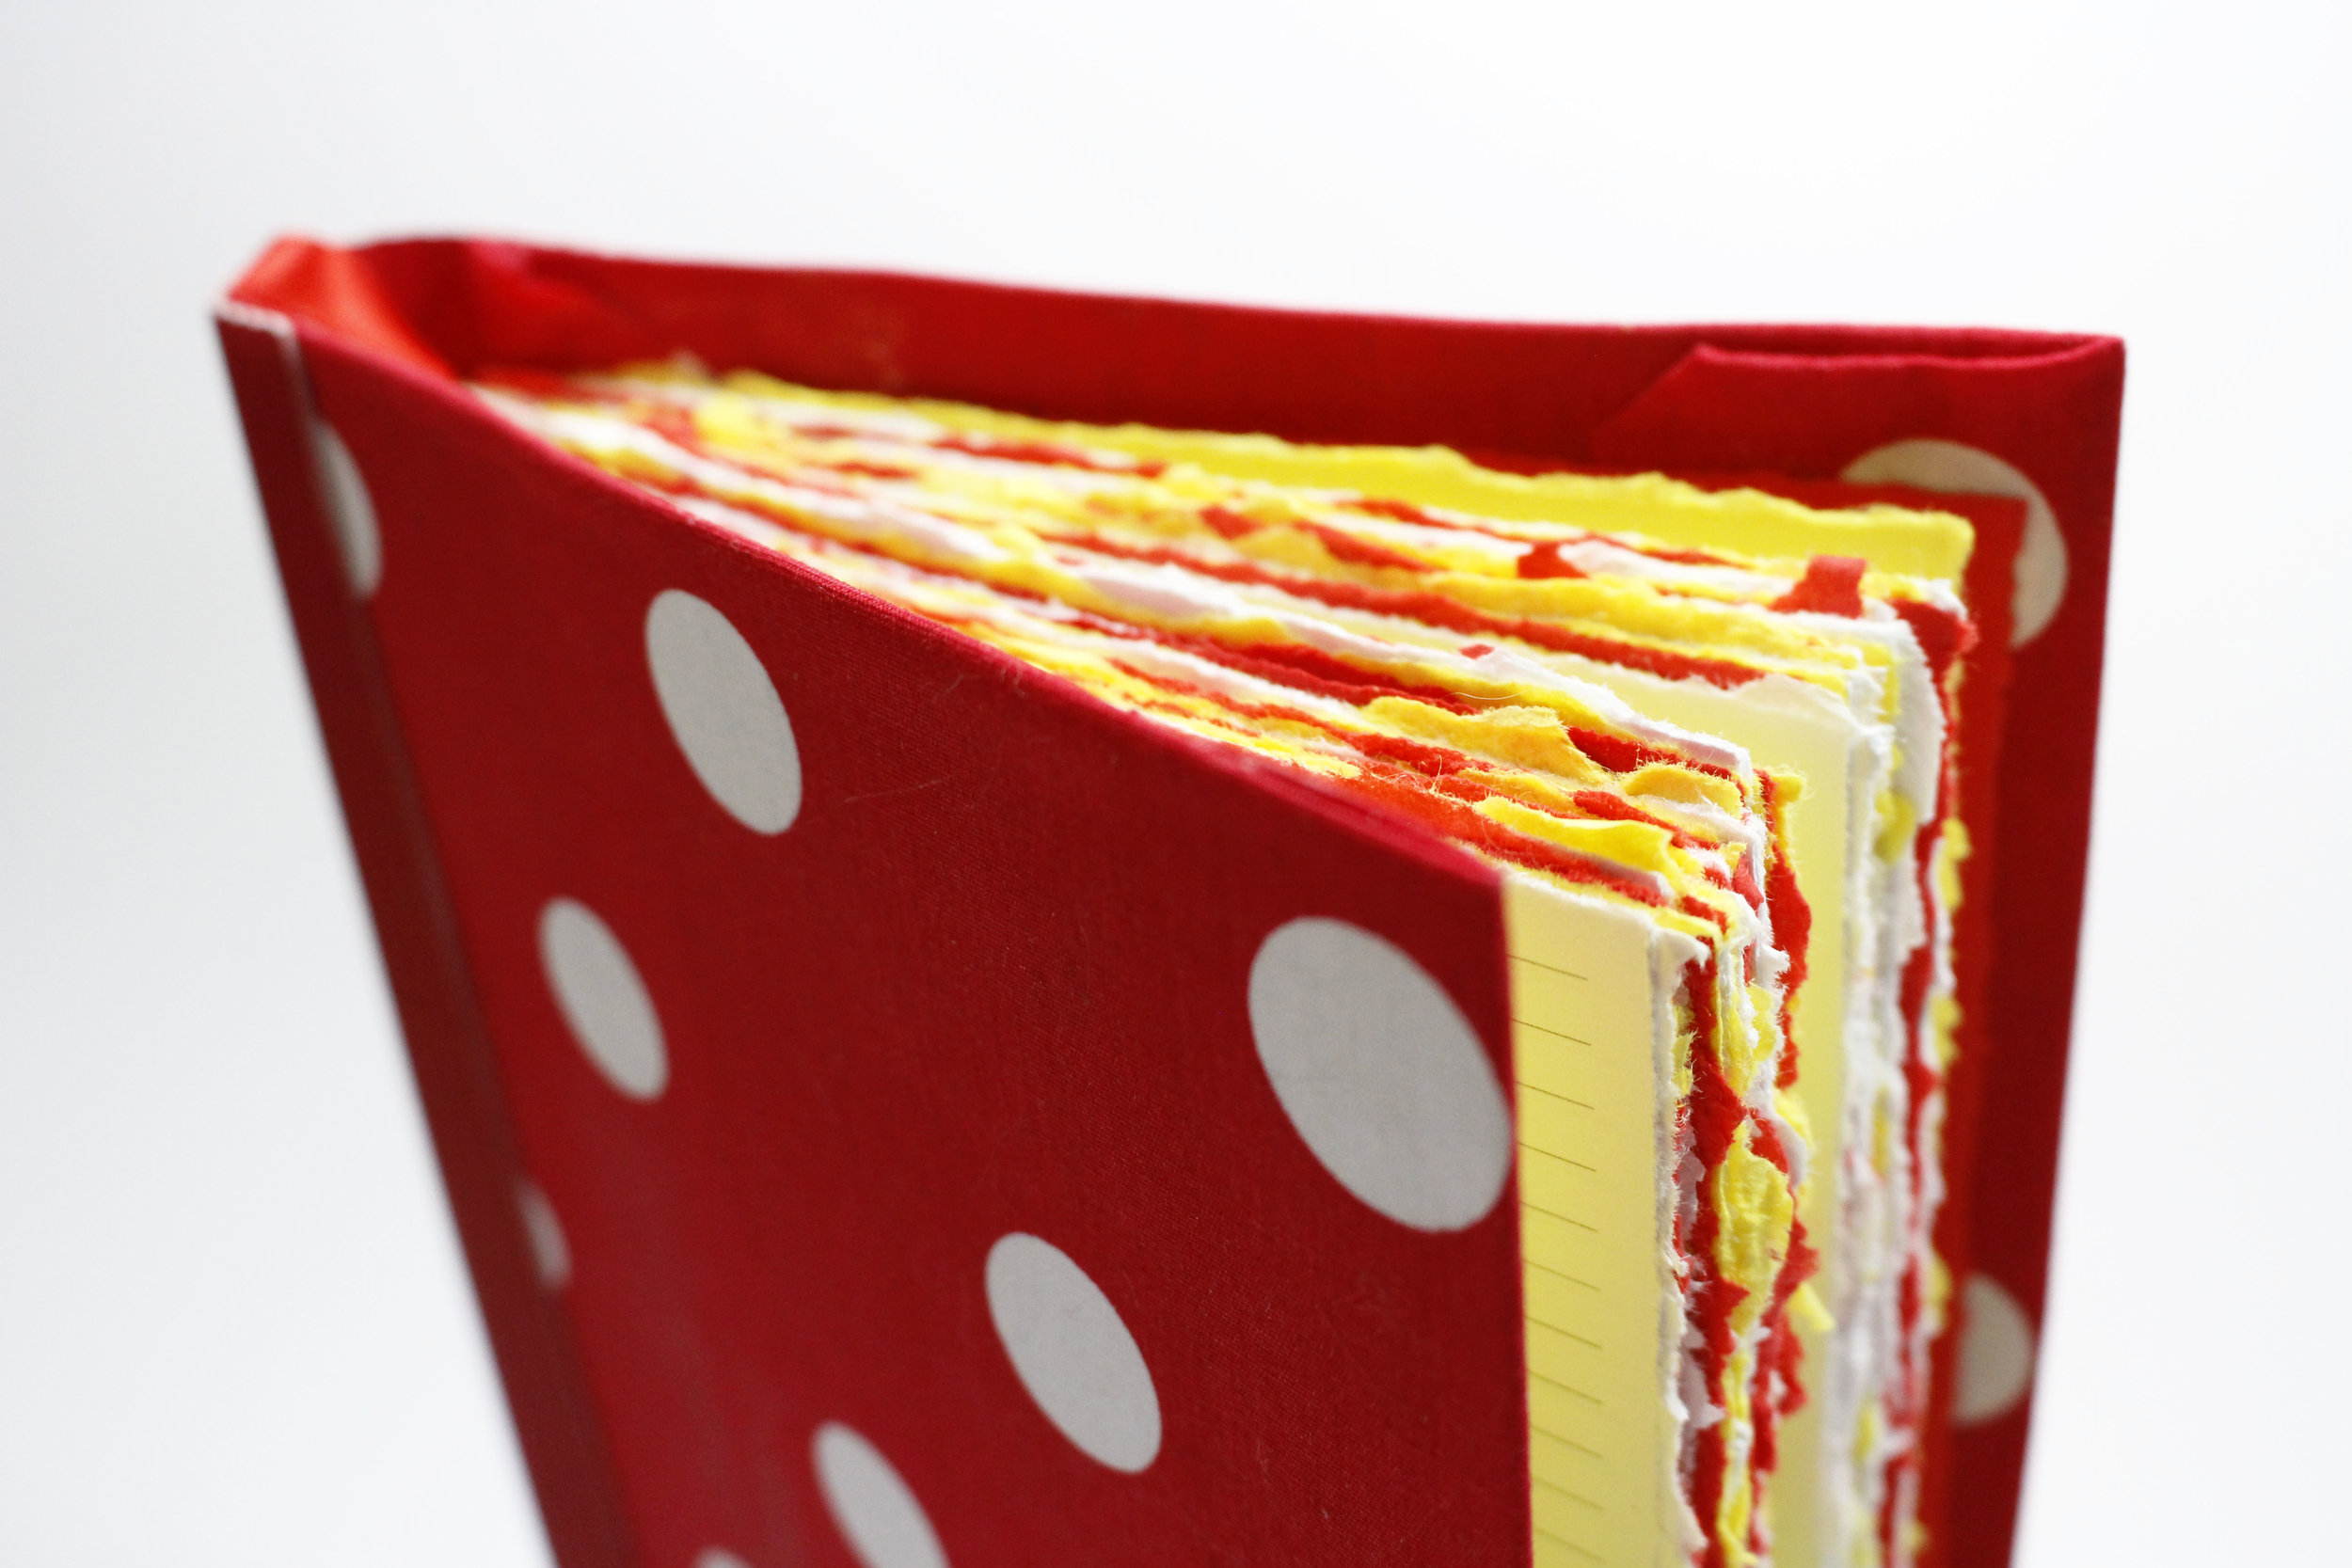 journal-polka-dots-red_6.JPG